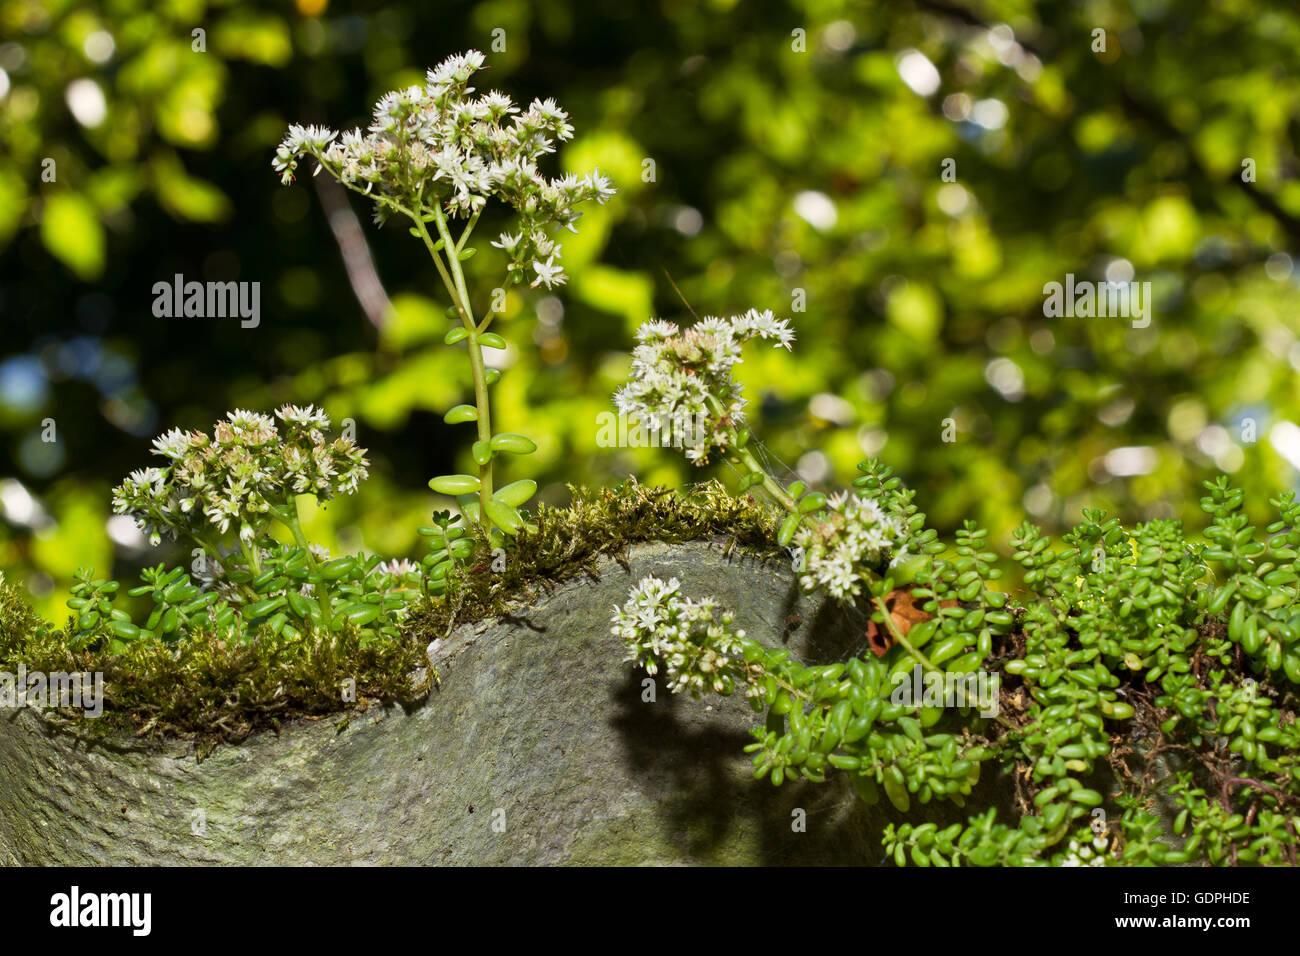 White stonecrop (Sedum album) on asbestos roof sheeting - Stock Image